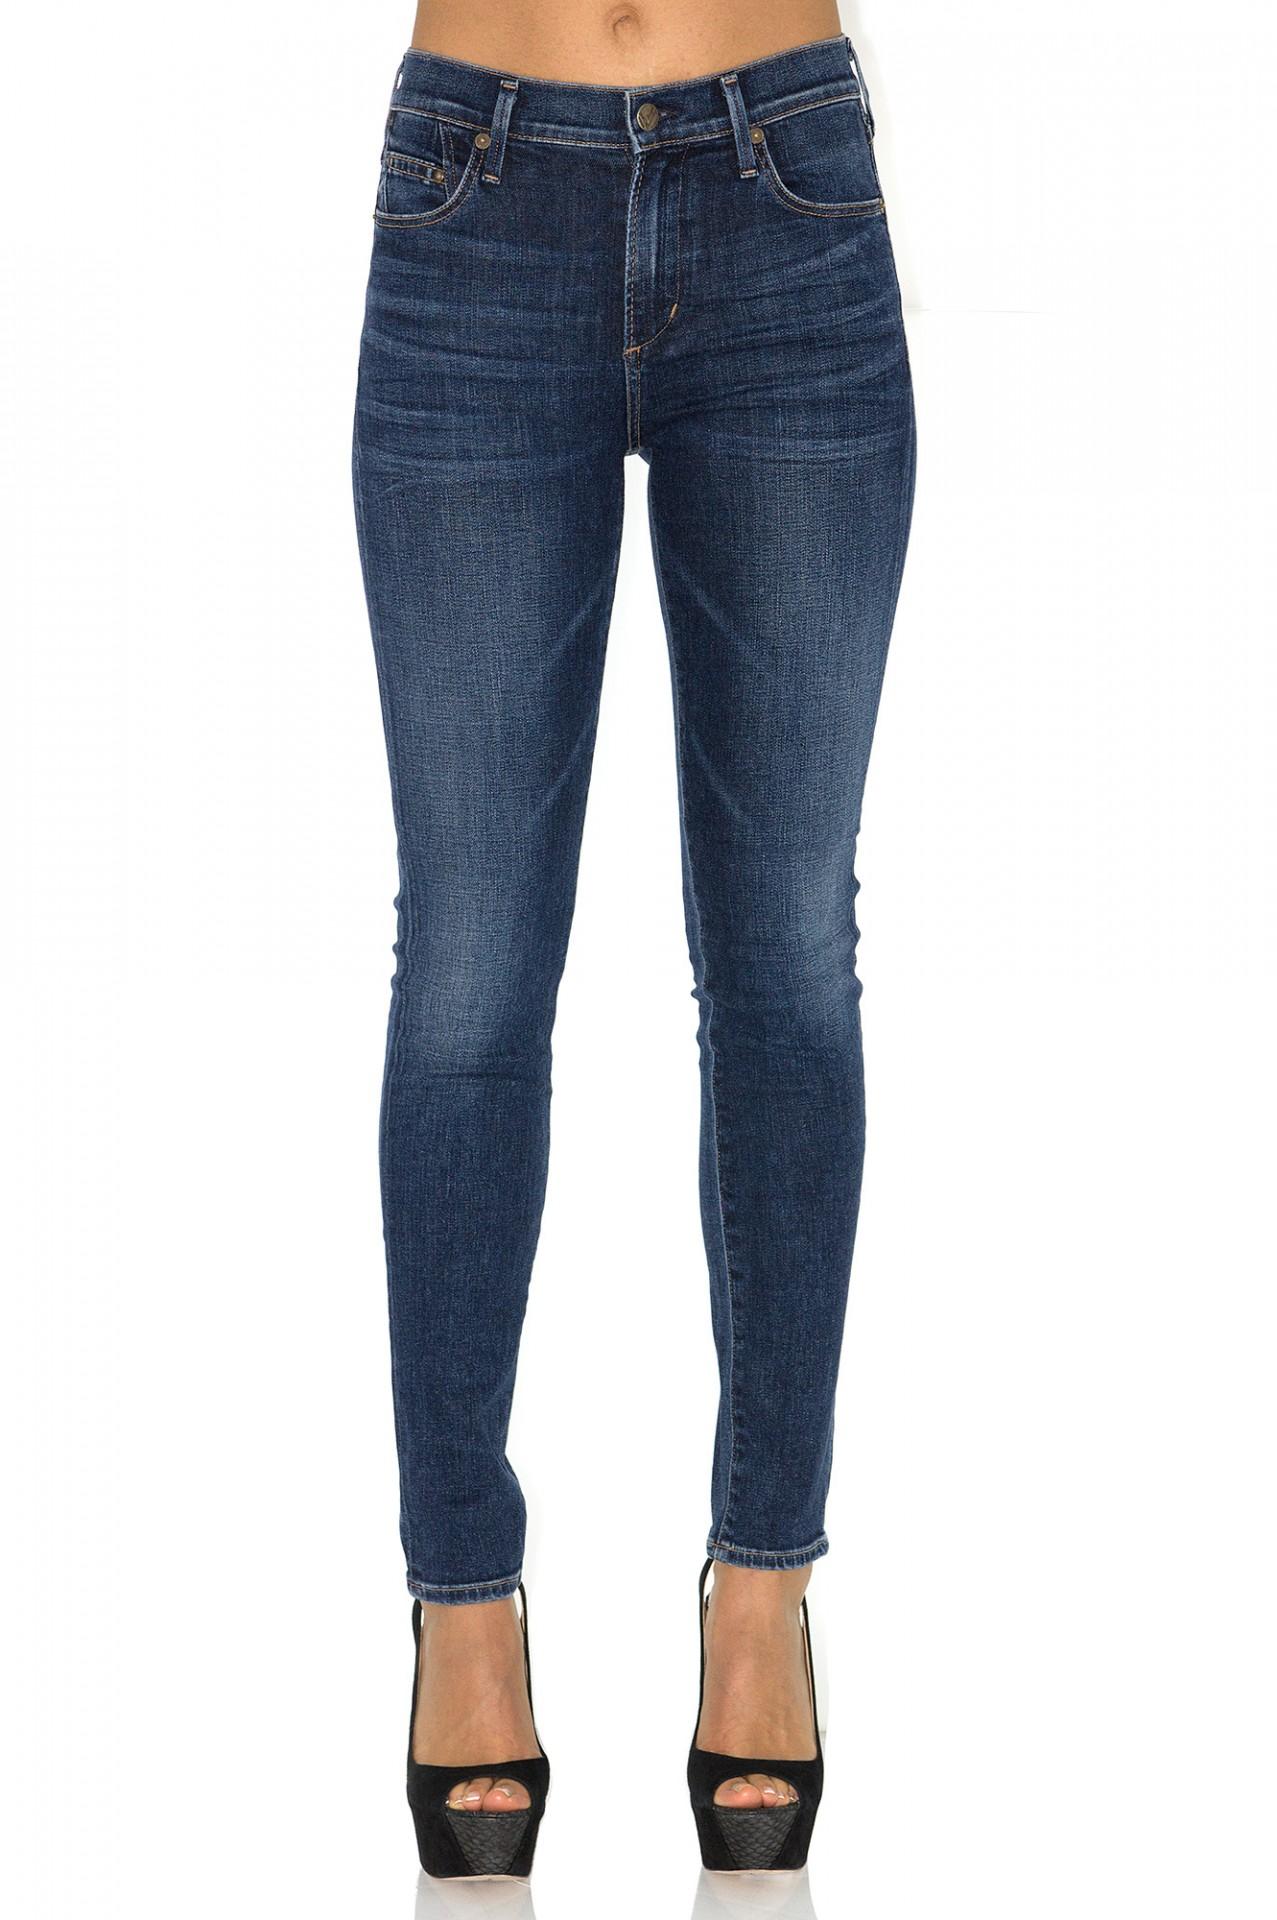 jeans slim taille haute bleu citizens of humanity stefanie stefanie renoma. Black Bedroom Furniture Sets. Home Design Ideas